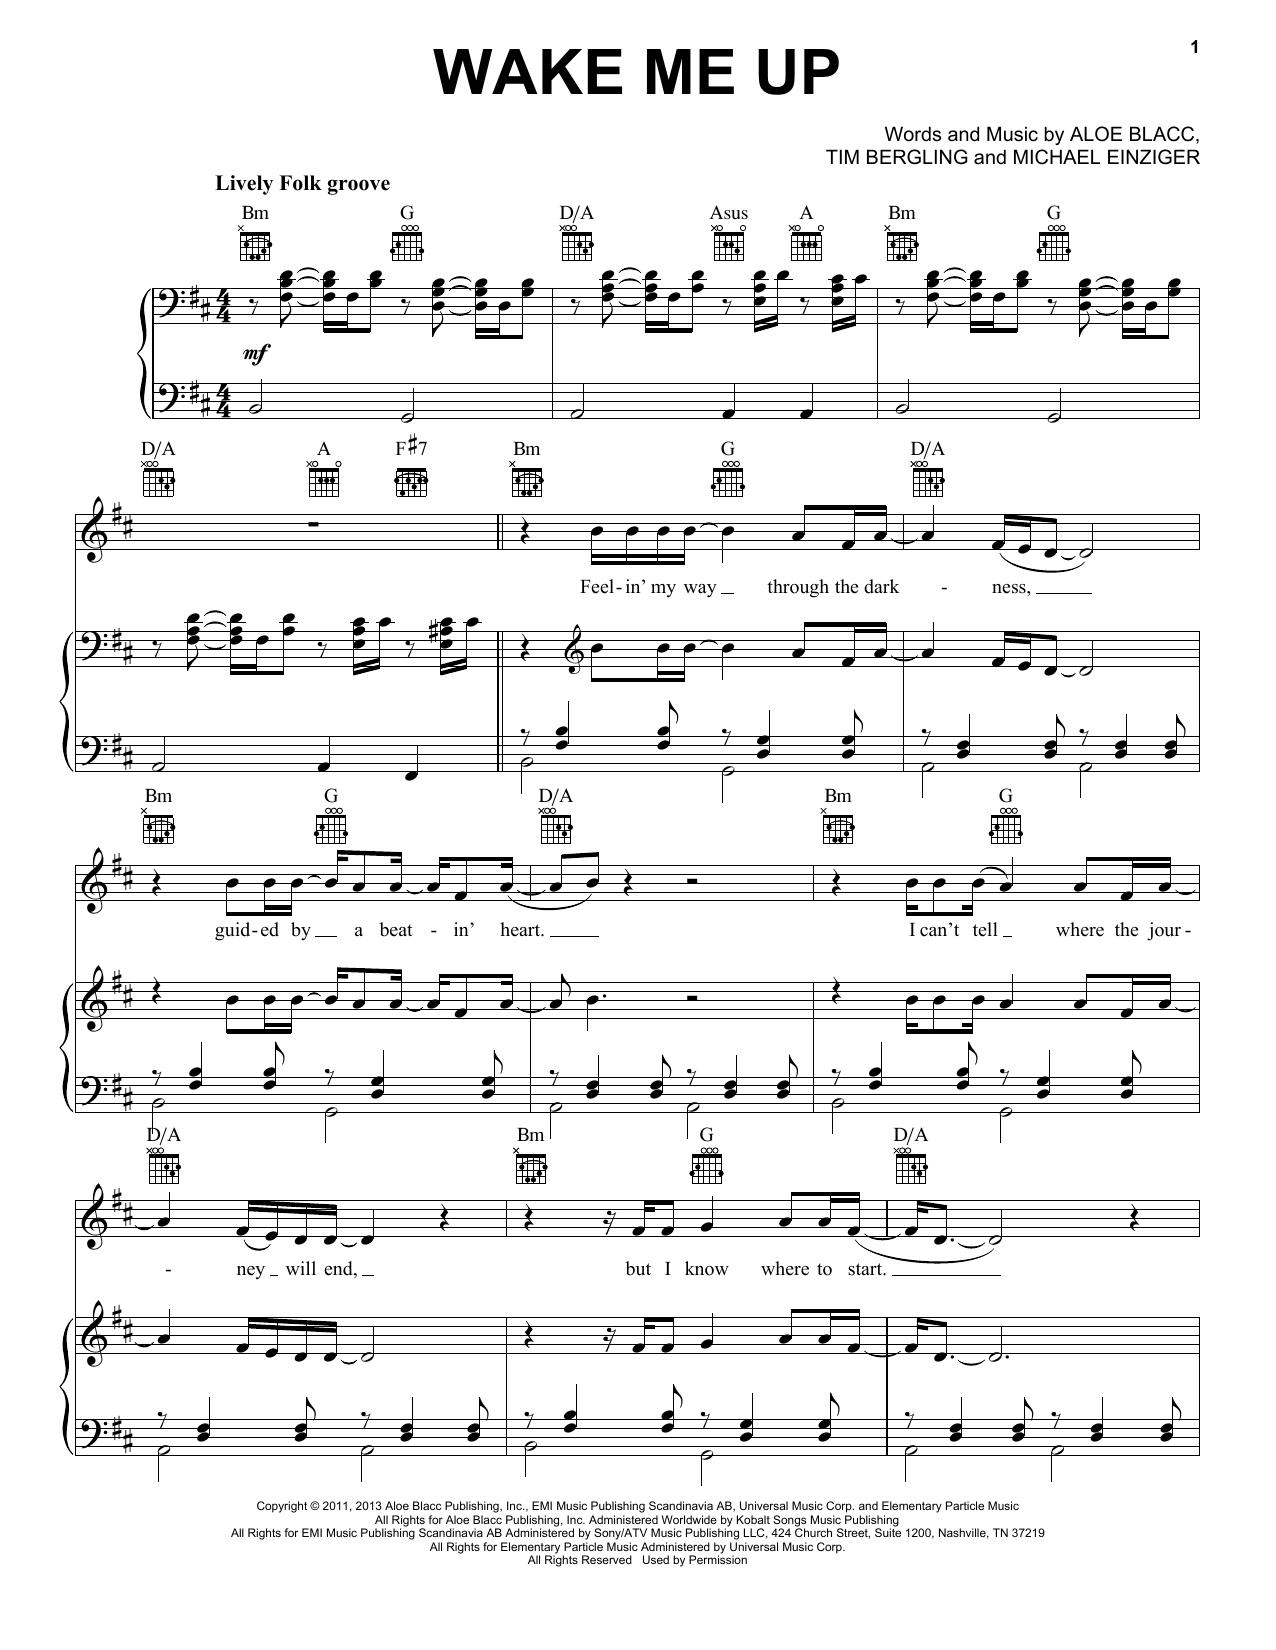 Avicii Wake Me Up Sheet Music Notes, Chords   Download Printable Easy  Guitar Tab PDF Score   SKU 15